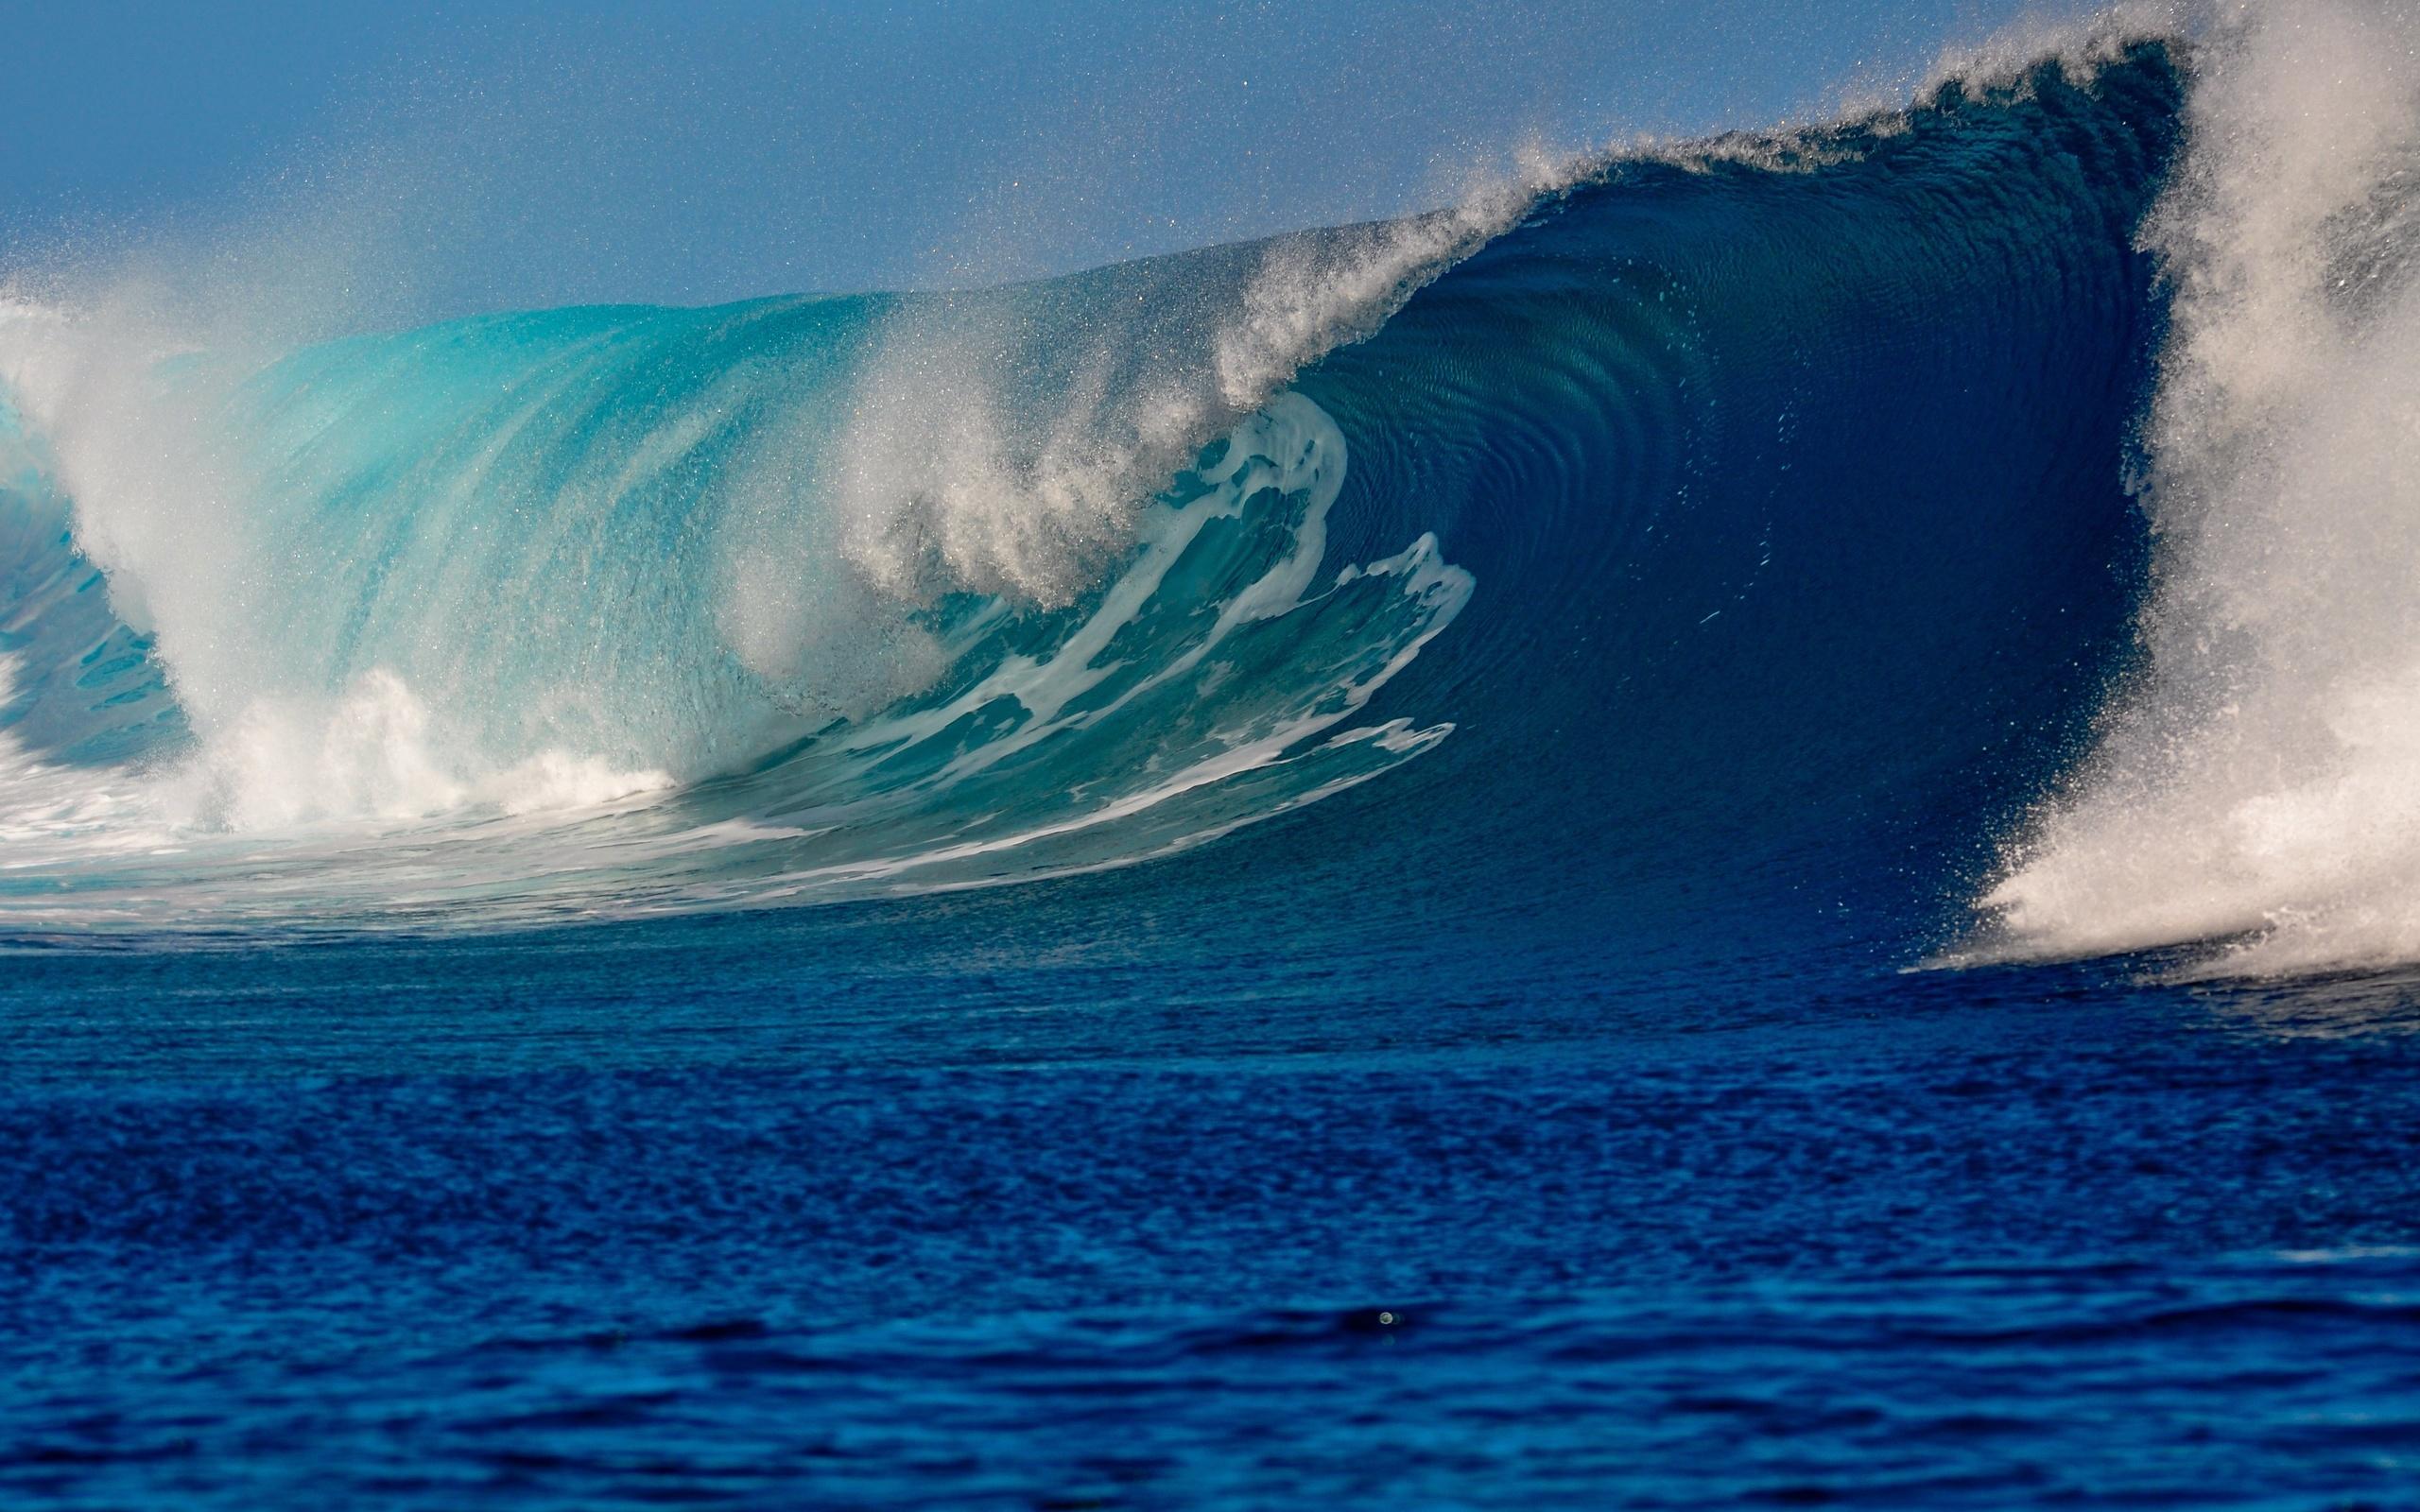 Открытки с океаном, букварь